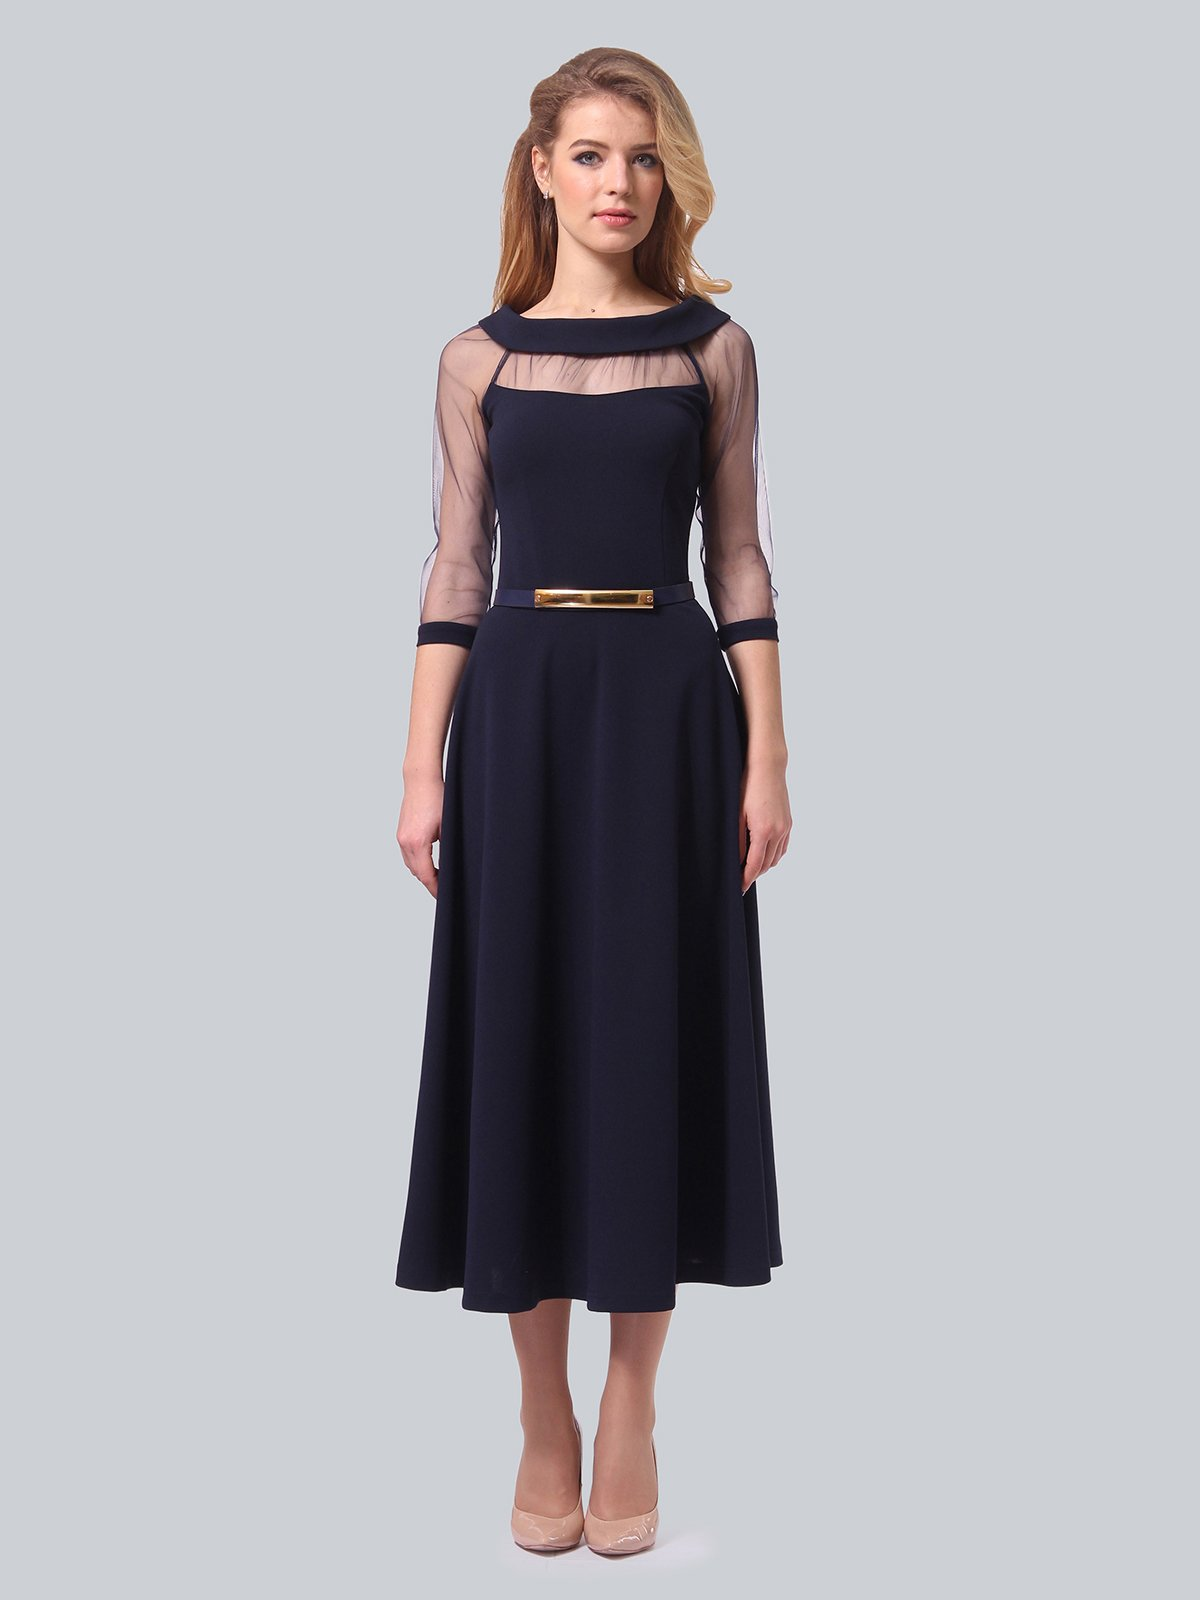 Платье темно-синее | 3879718 | фото 4